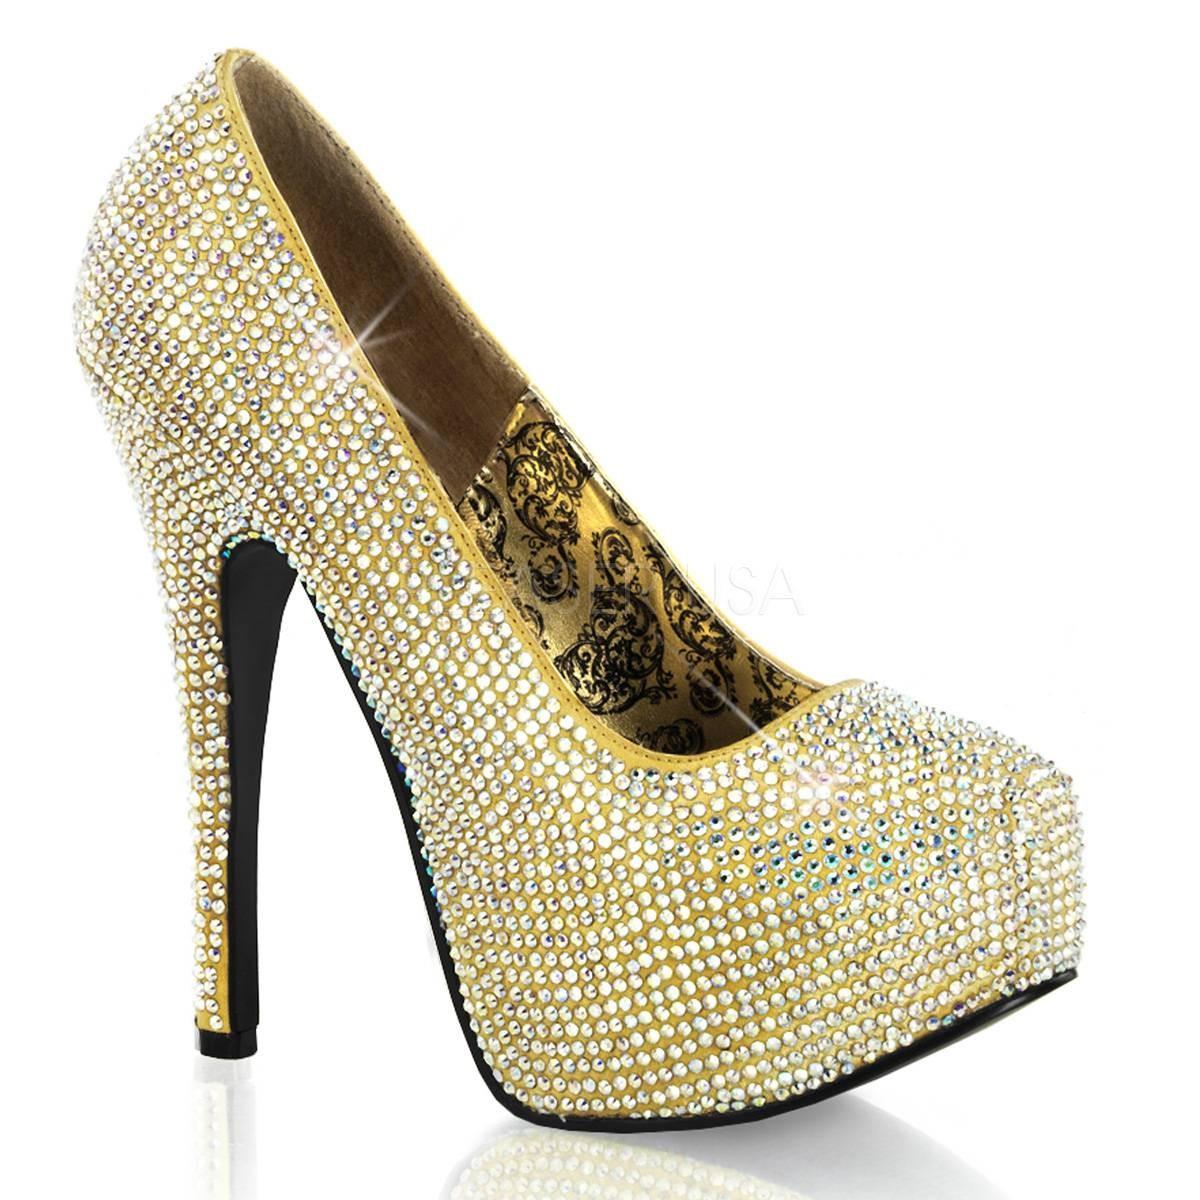 Highheels - TEEZE 06R ° Damen Pumps ° Gold Satin ° Bordello  - Onlineshop RedSixty